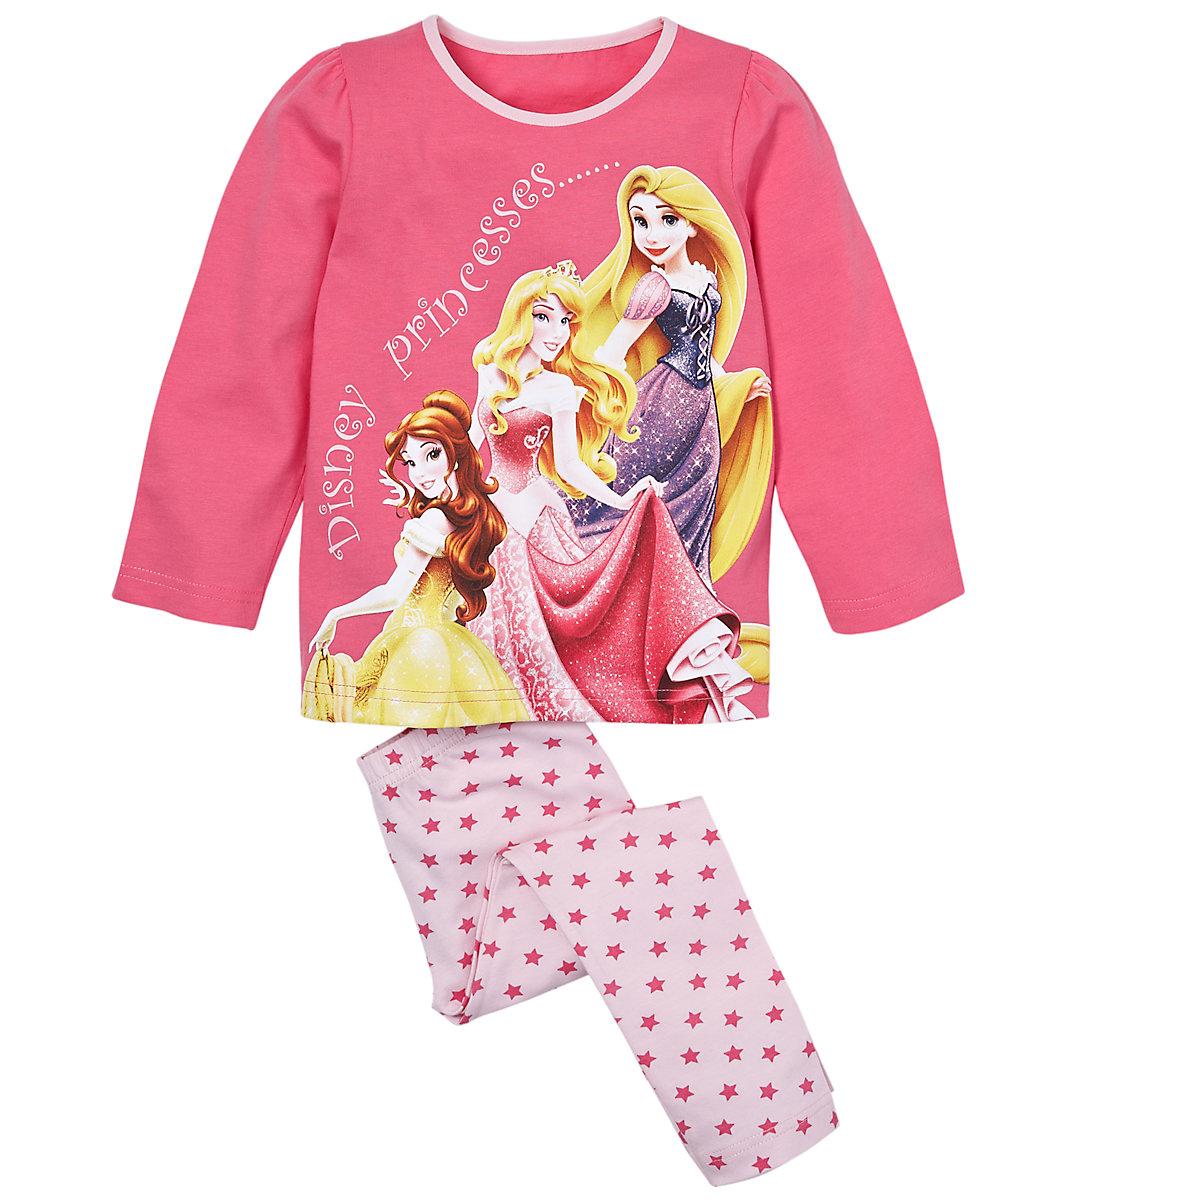 Disney Princess Pyjamas - Disney Princess Gifts